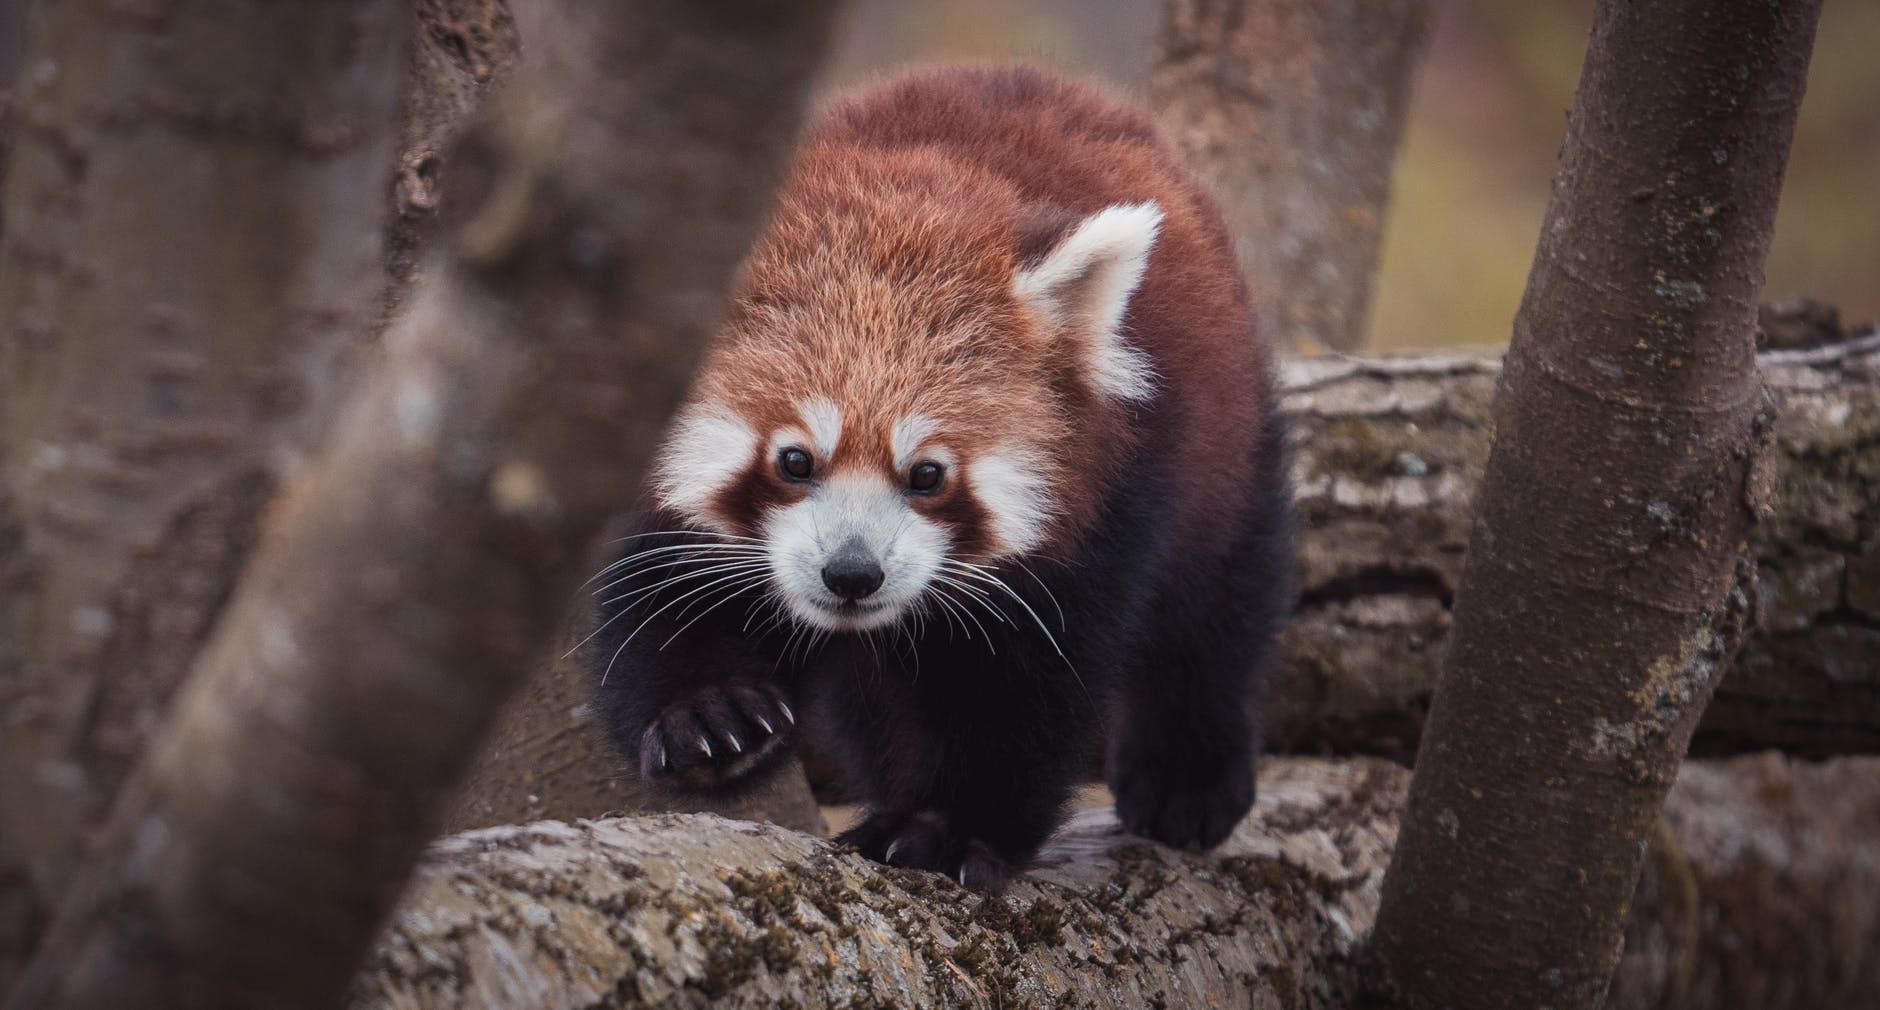 red panda walking on tree trunk in zoo